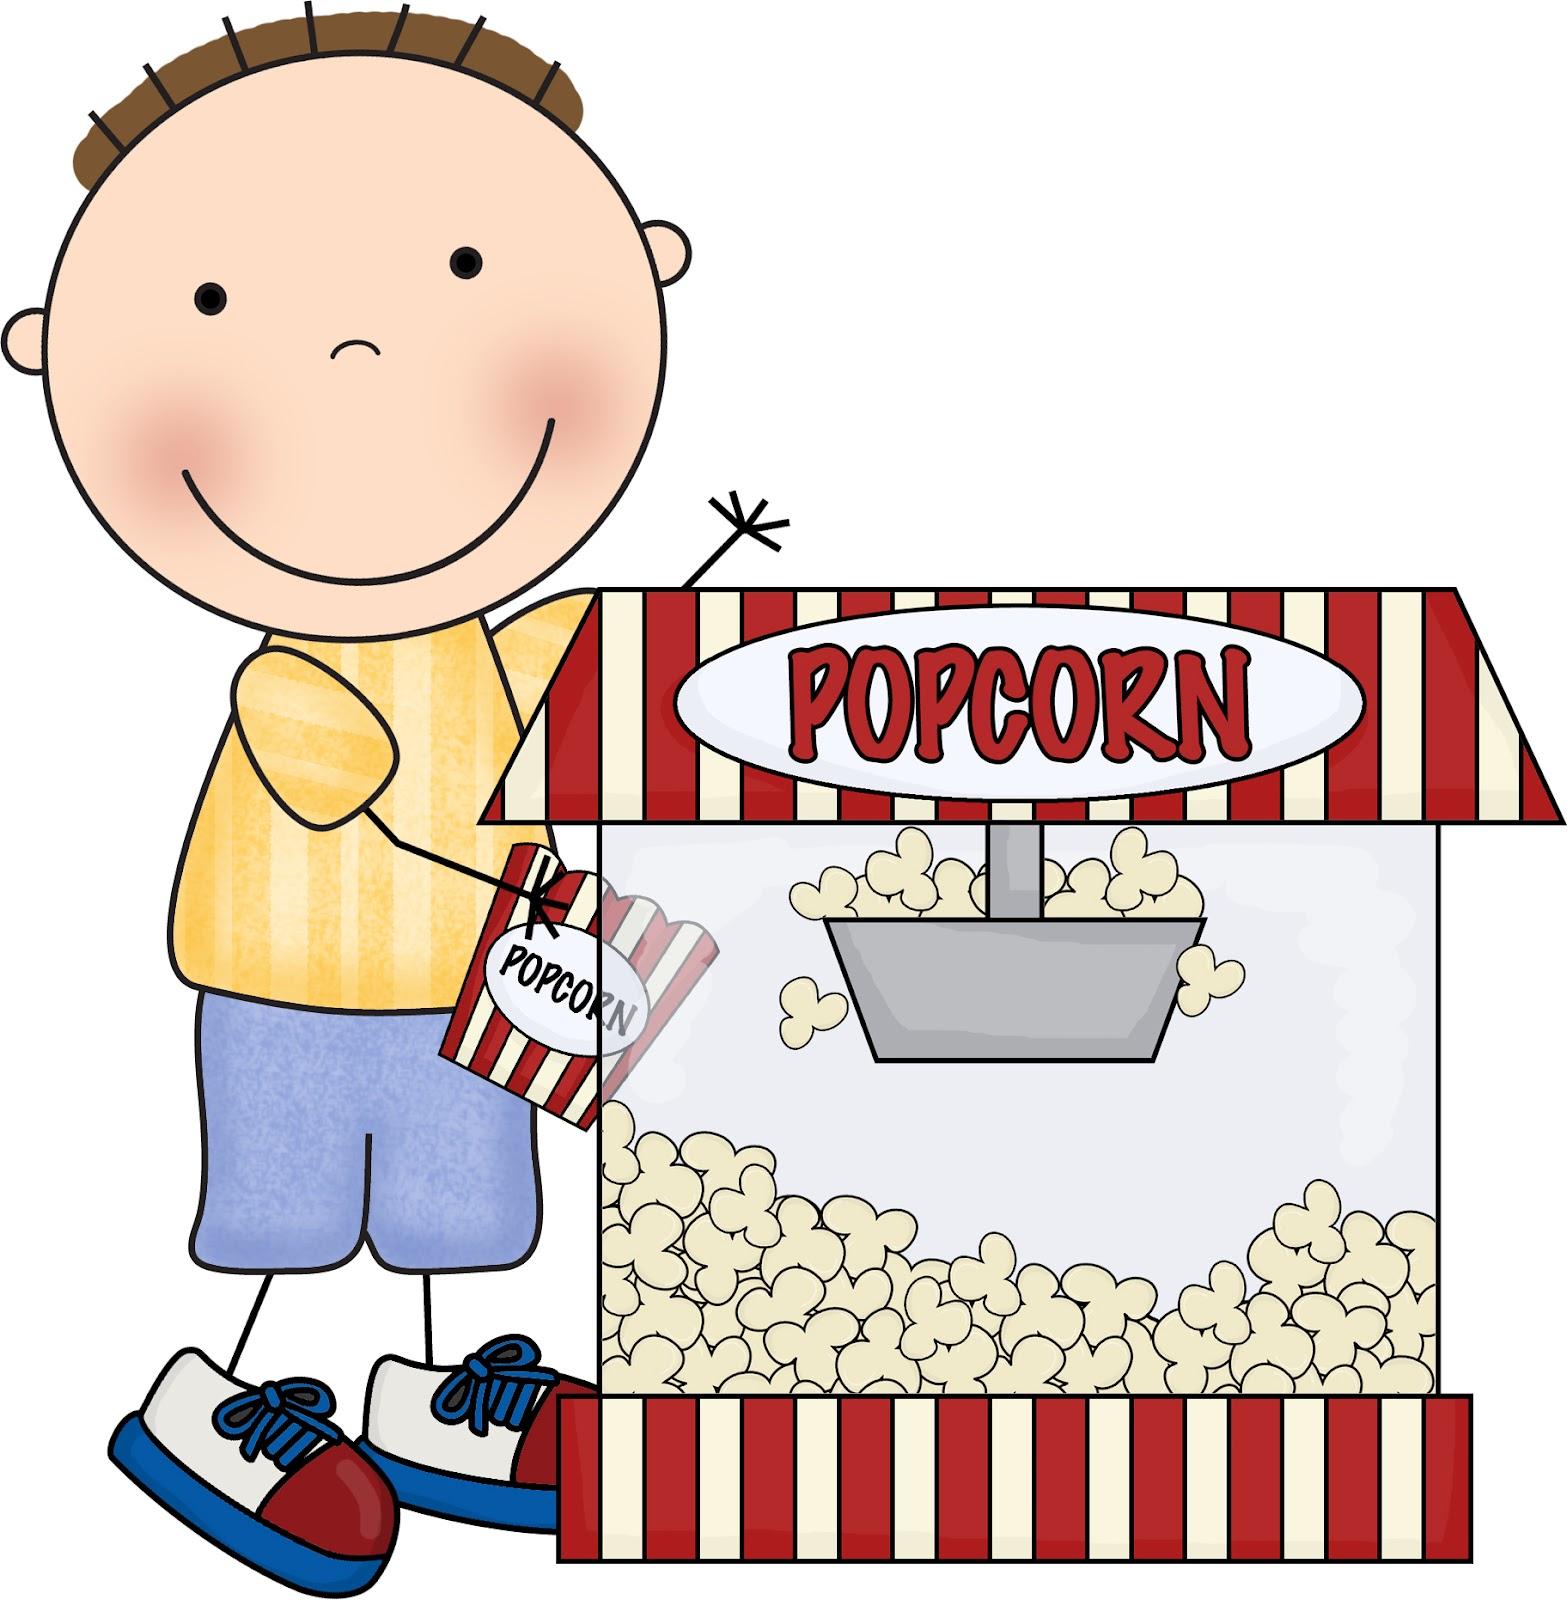 Popcorn kernel clipart free images 13